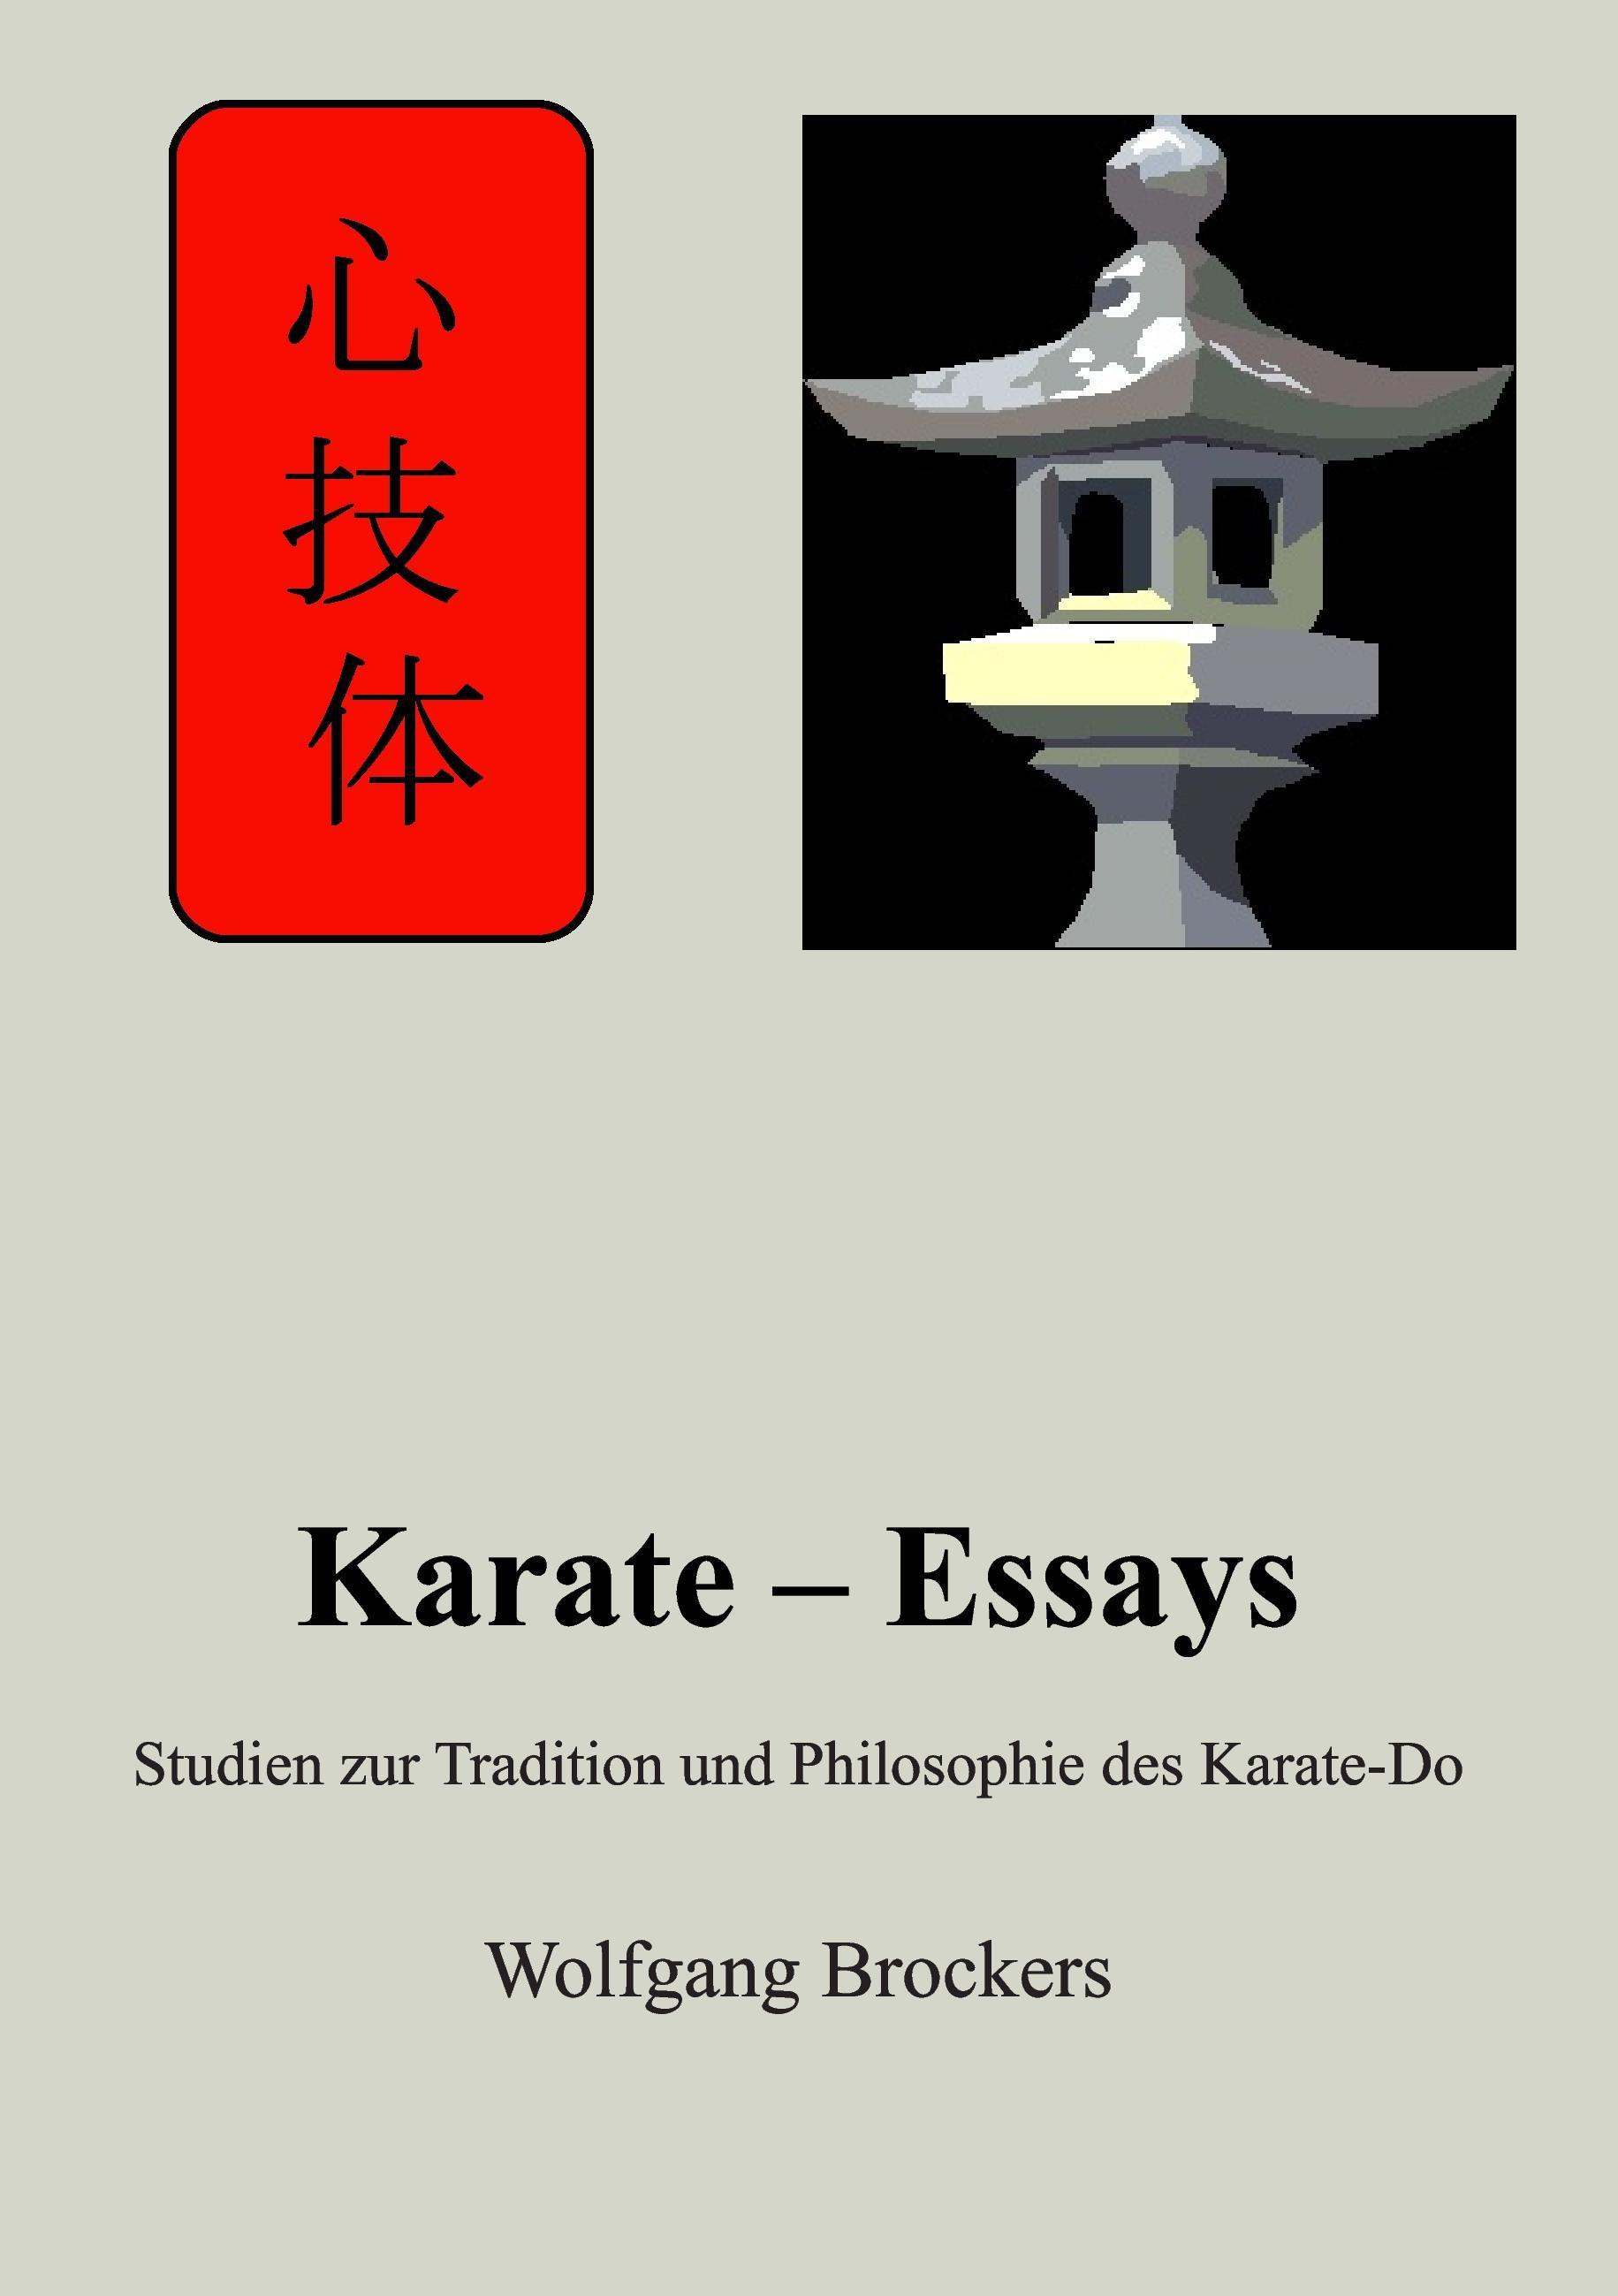 Karate - Essays